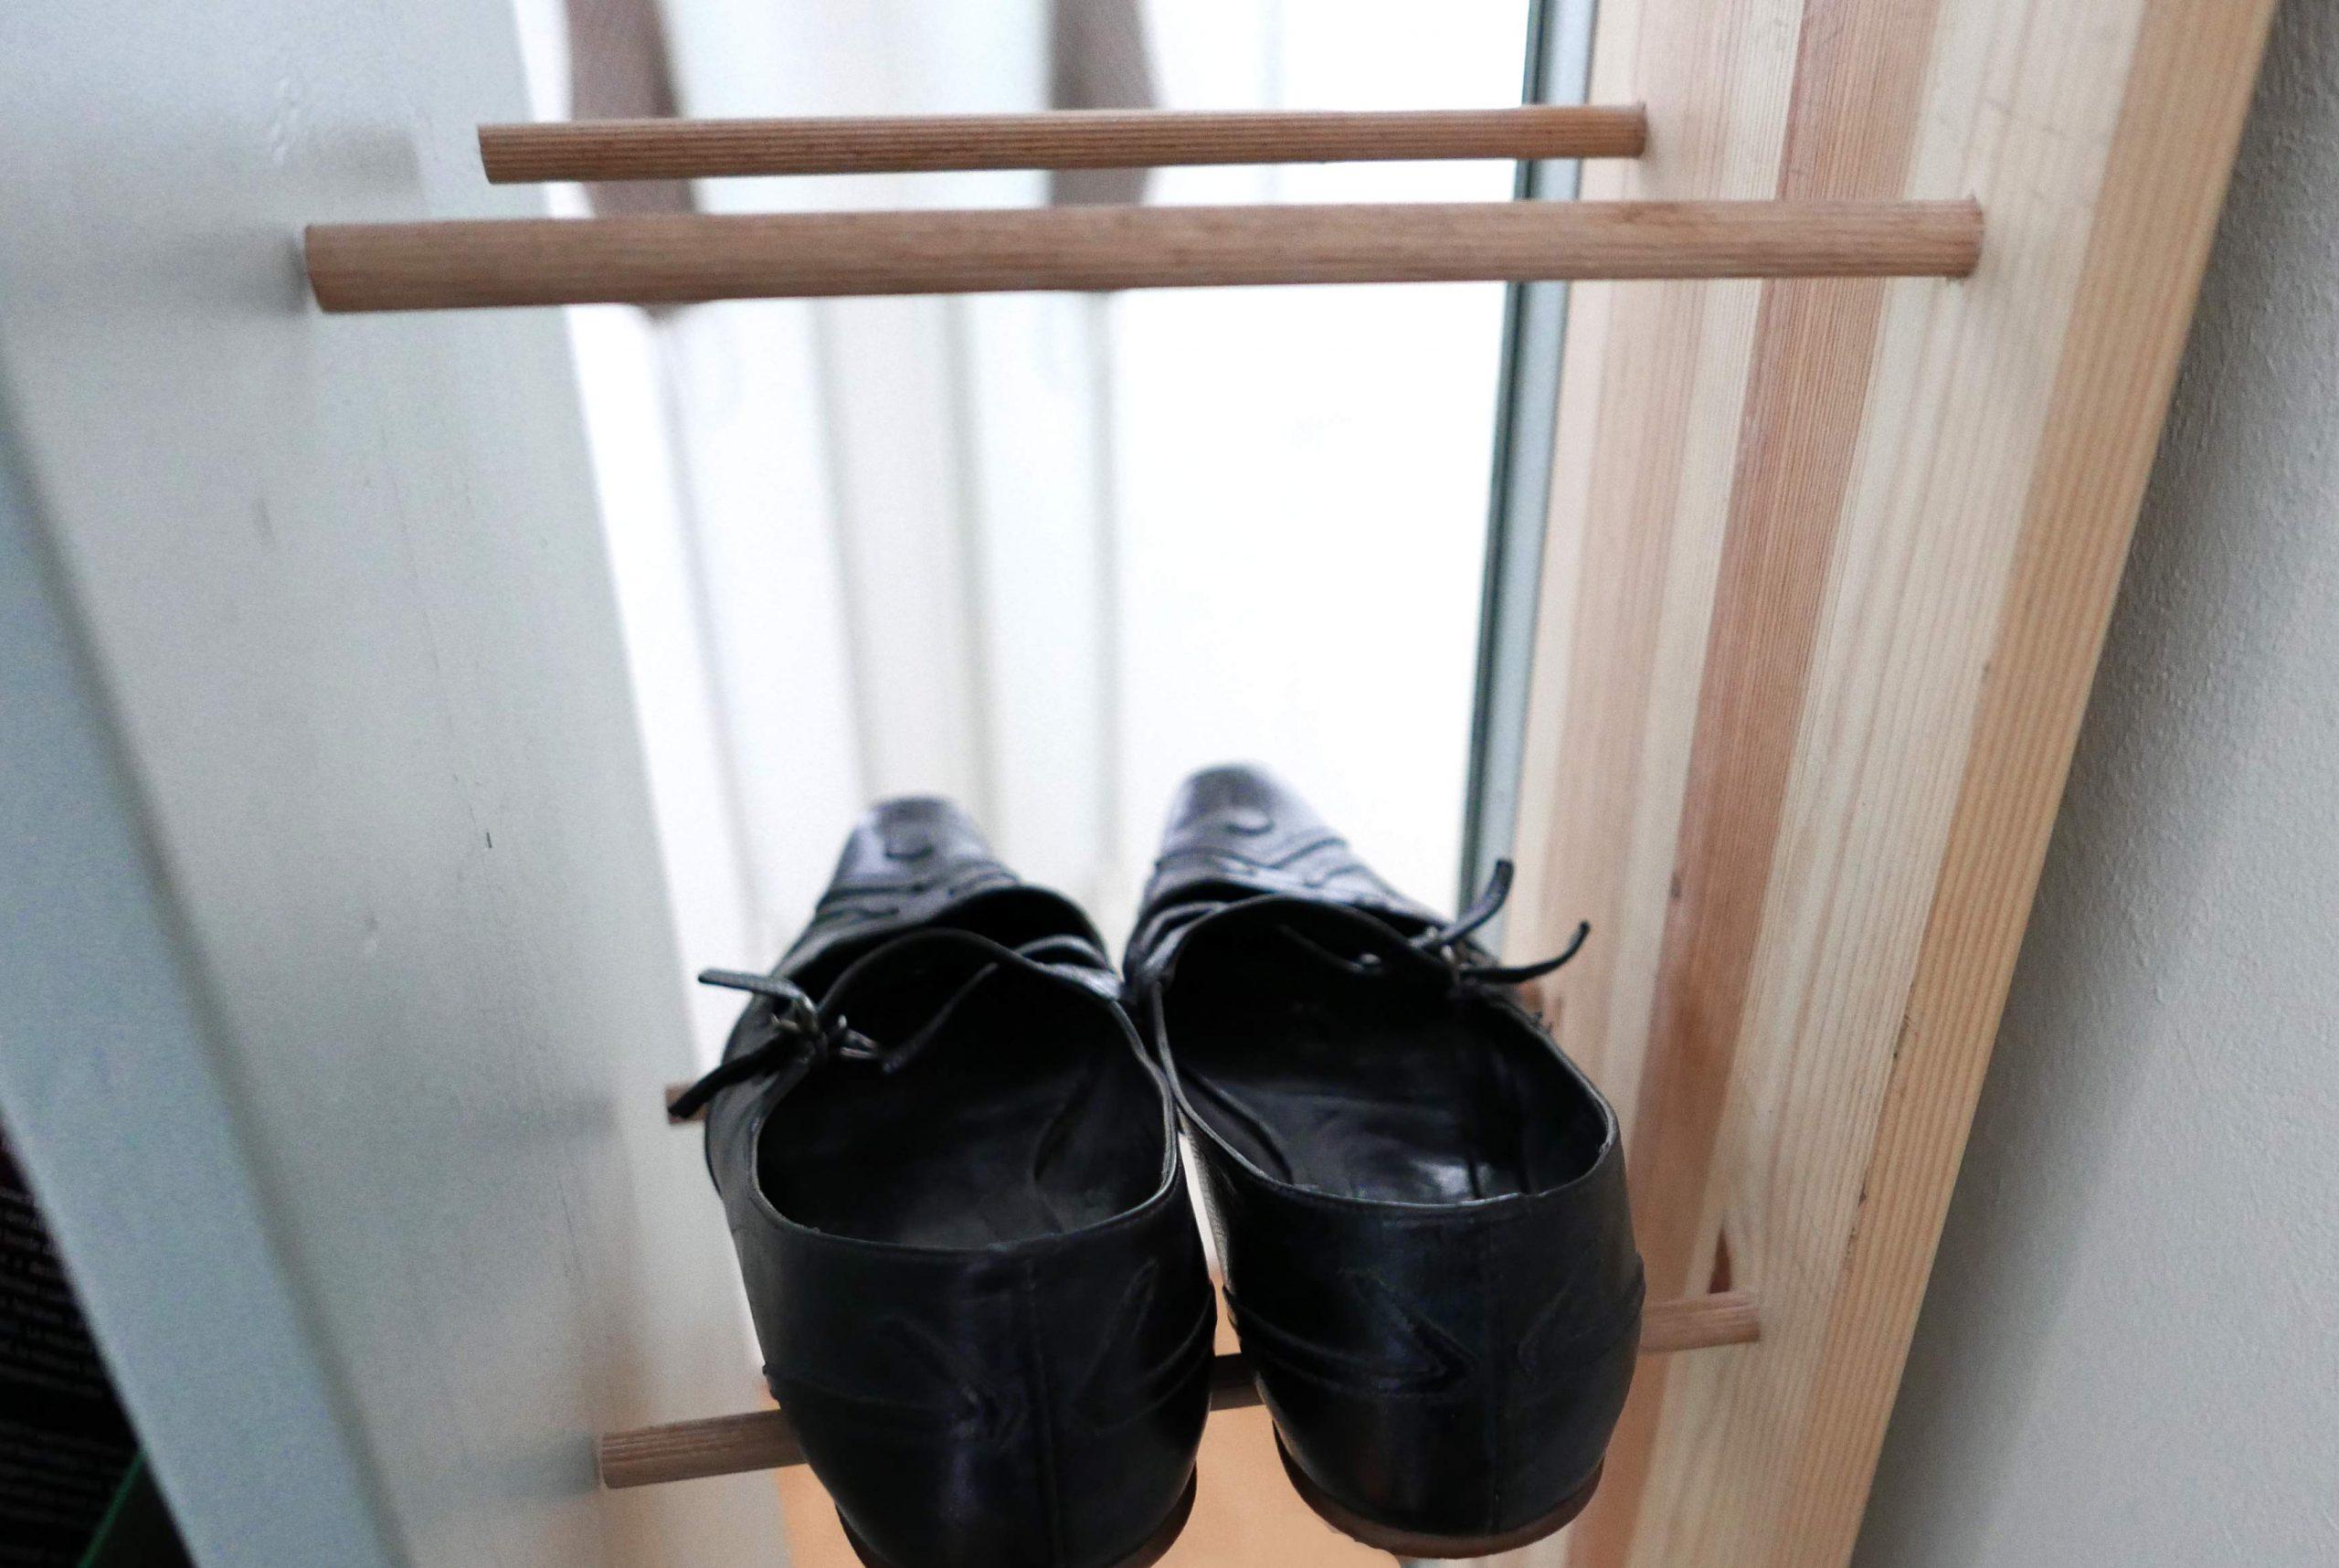 Holz Schuhregal mit Pumps